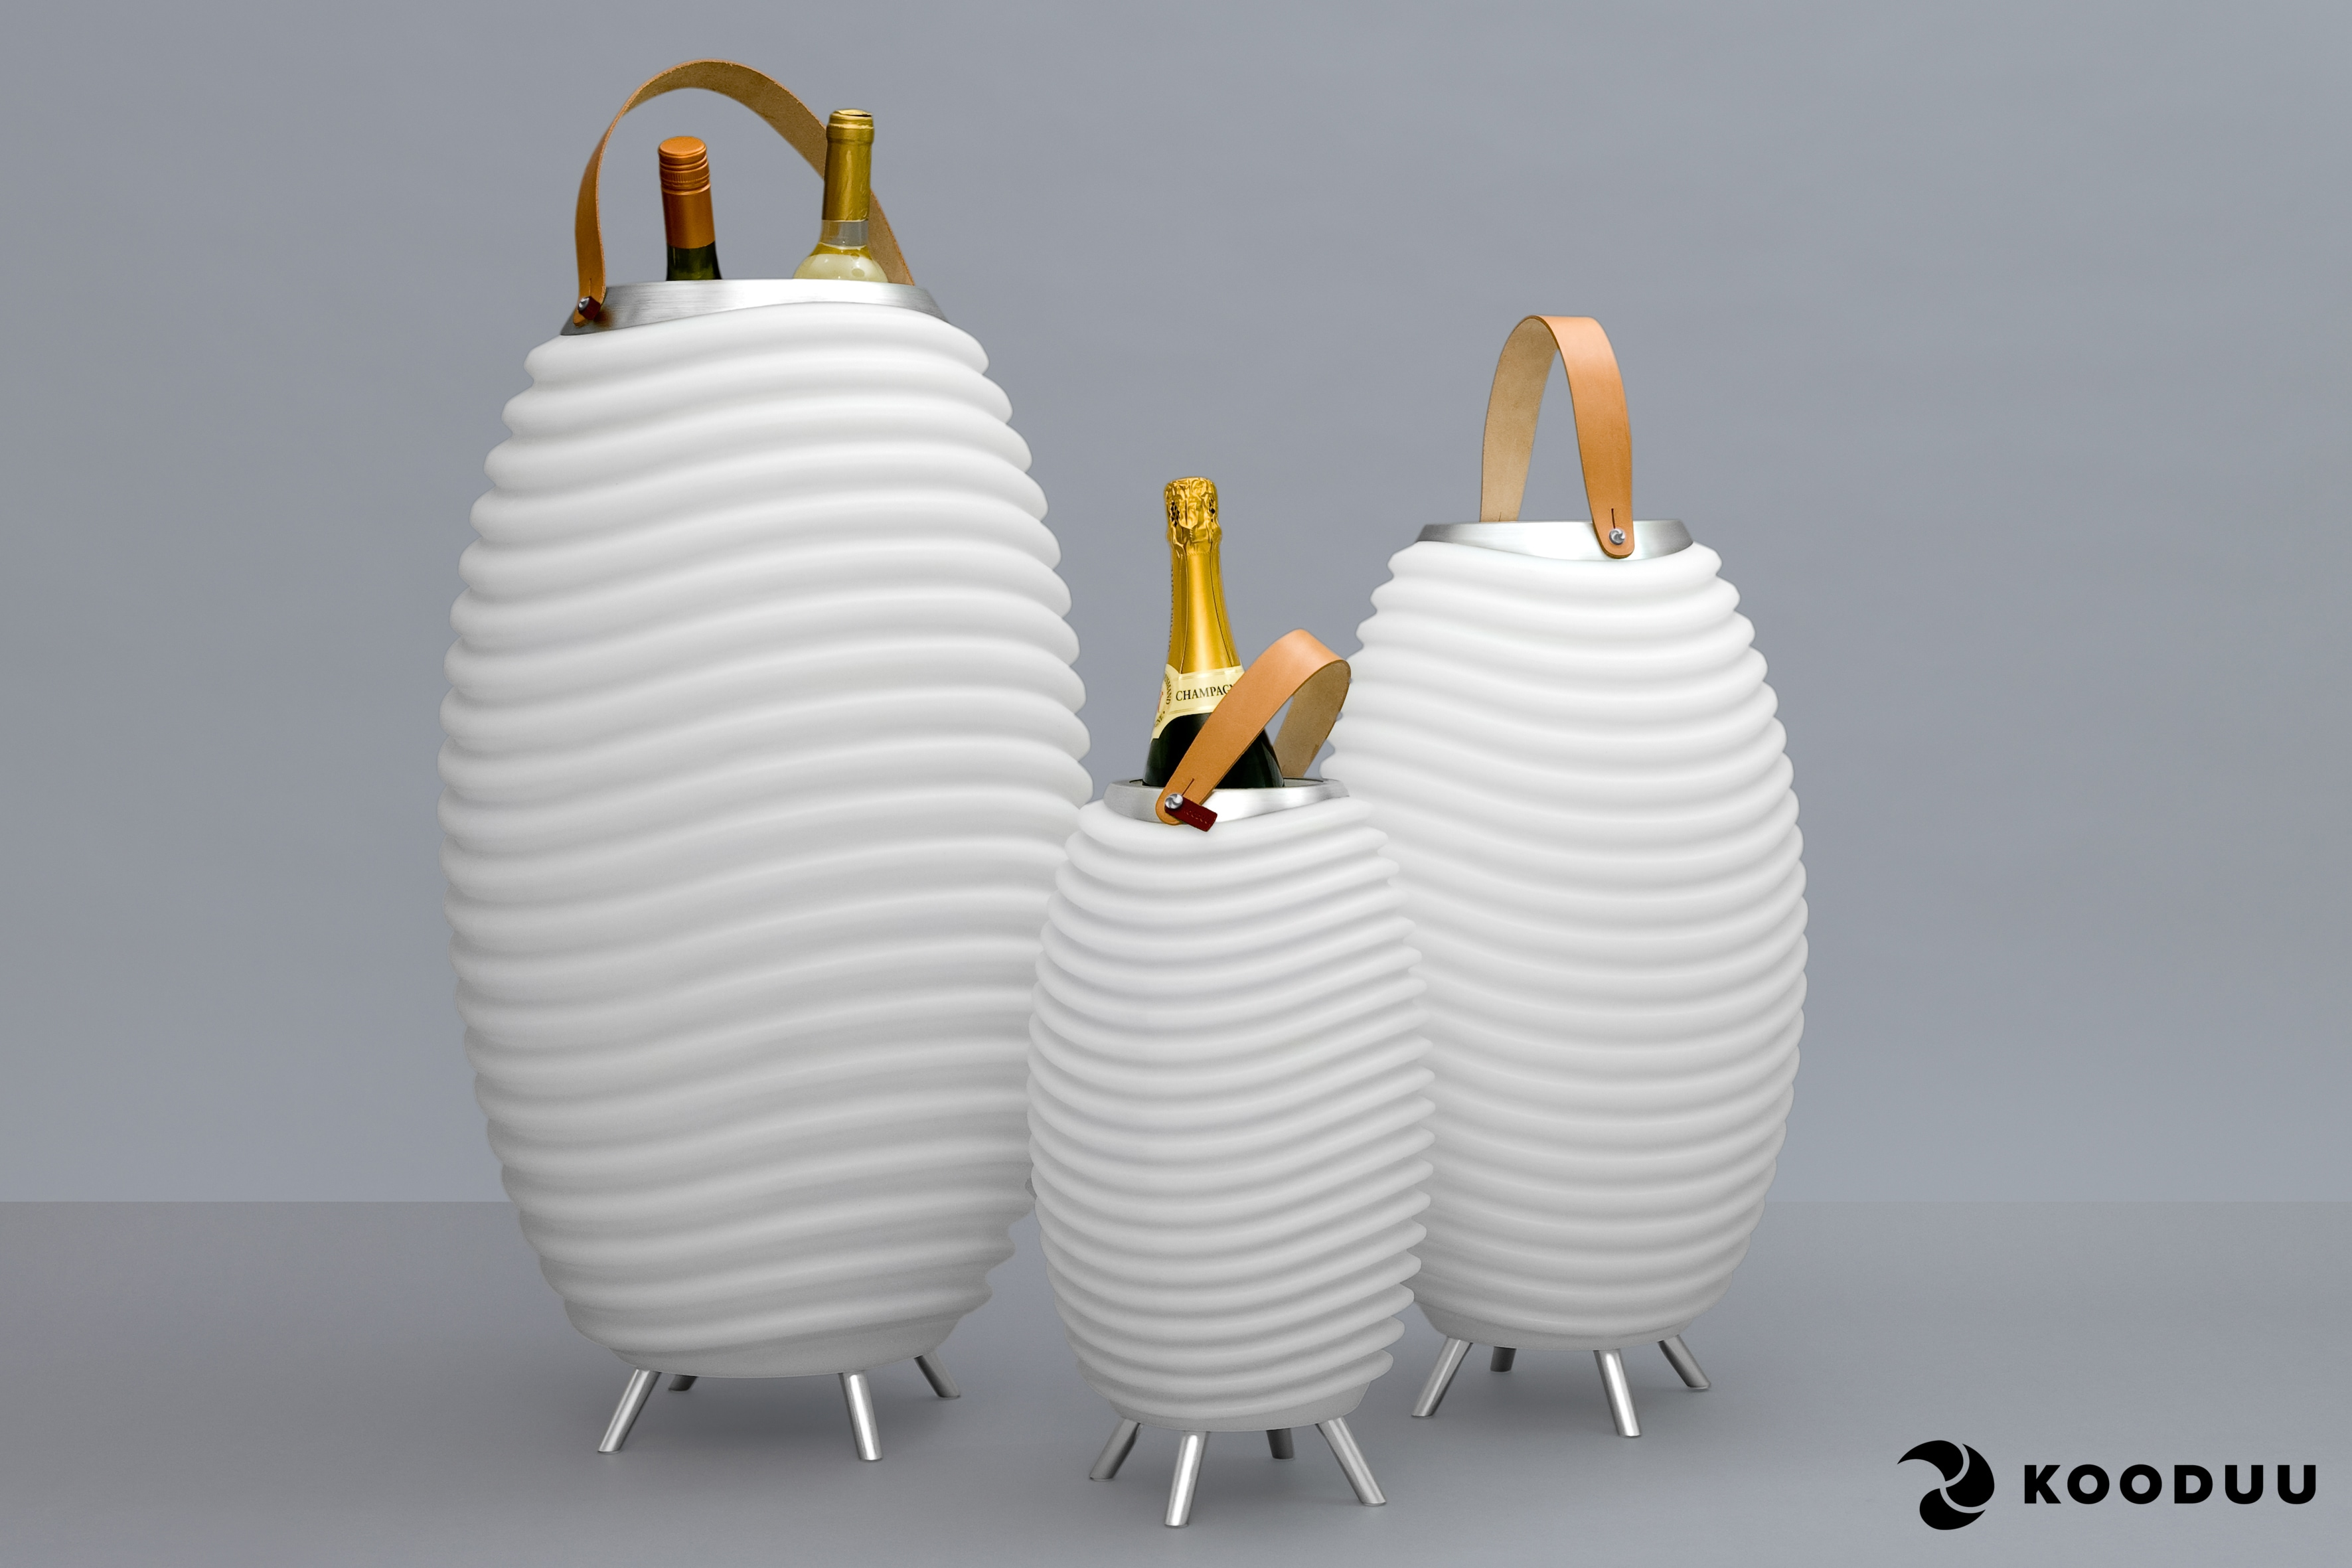 kooduu LED Stehlampe Synergy S, 1 St., Warmweiß, 3-in 1 LED Designer-Lampe, günstig online kaufen